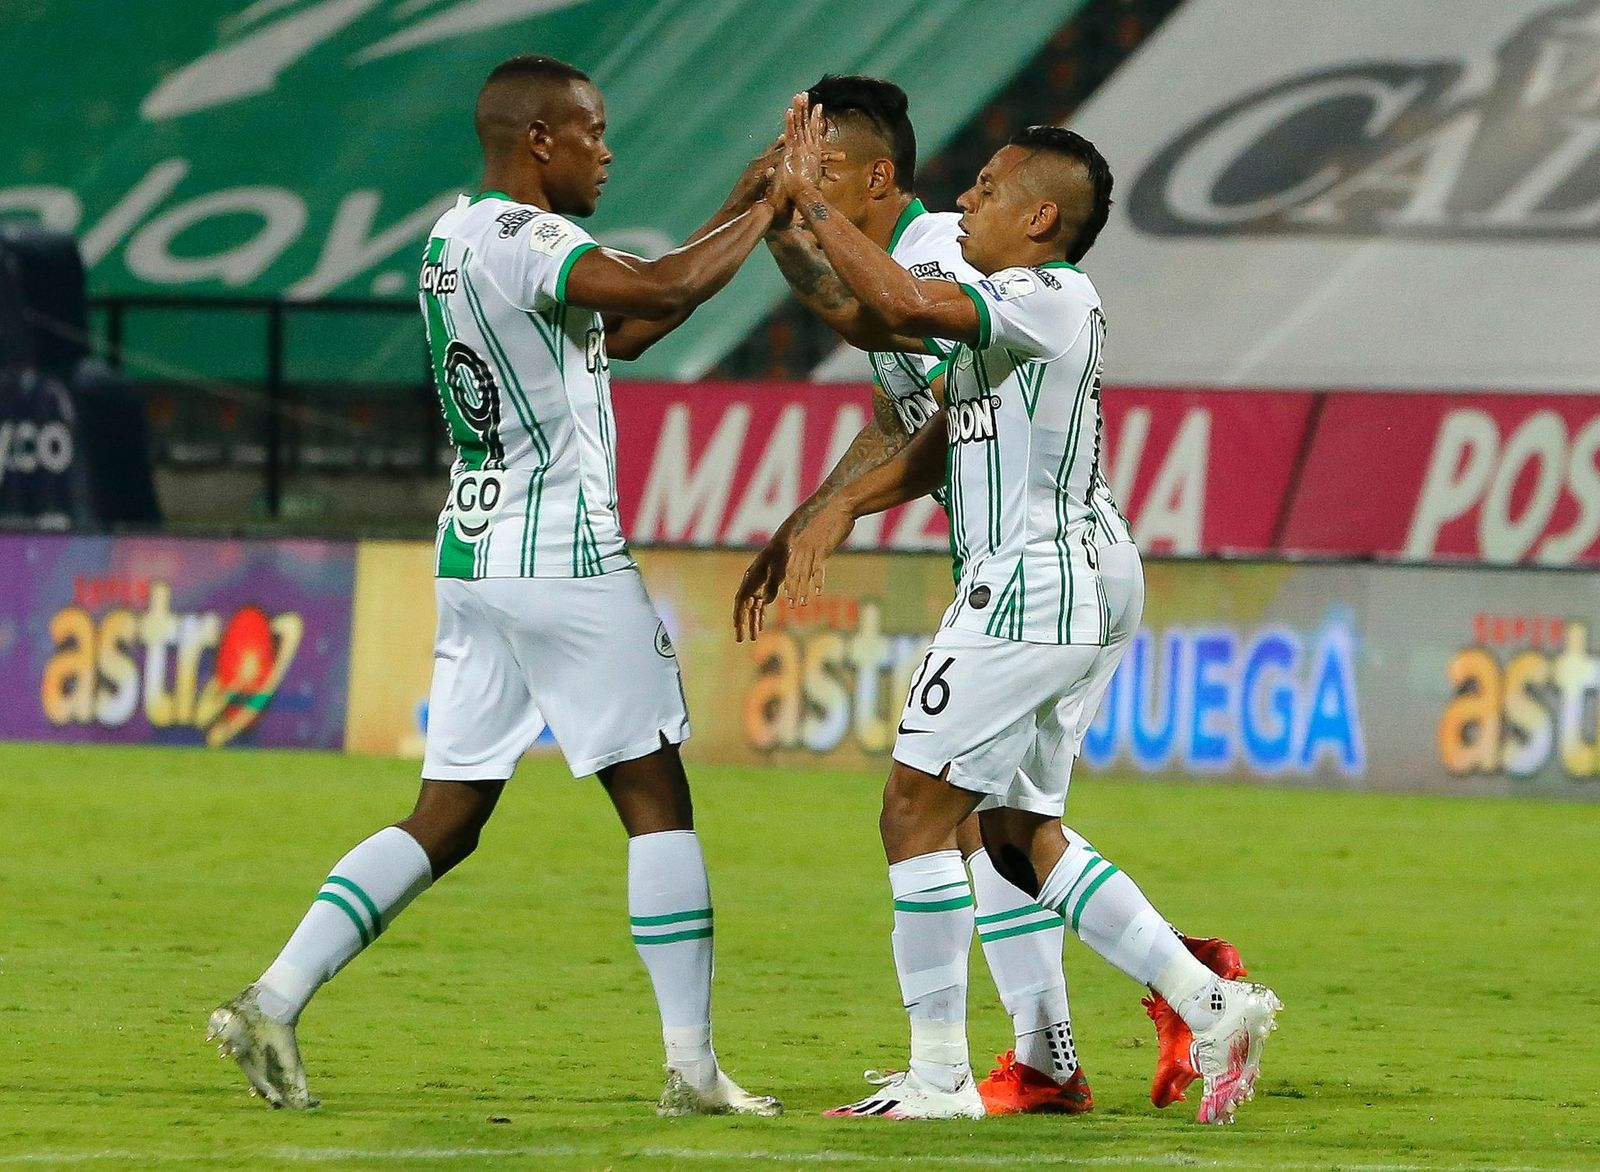 Nacional venció a Envigado; Liga Betplay, fecha 11: resumen y goles | Antena 2